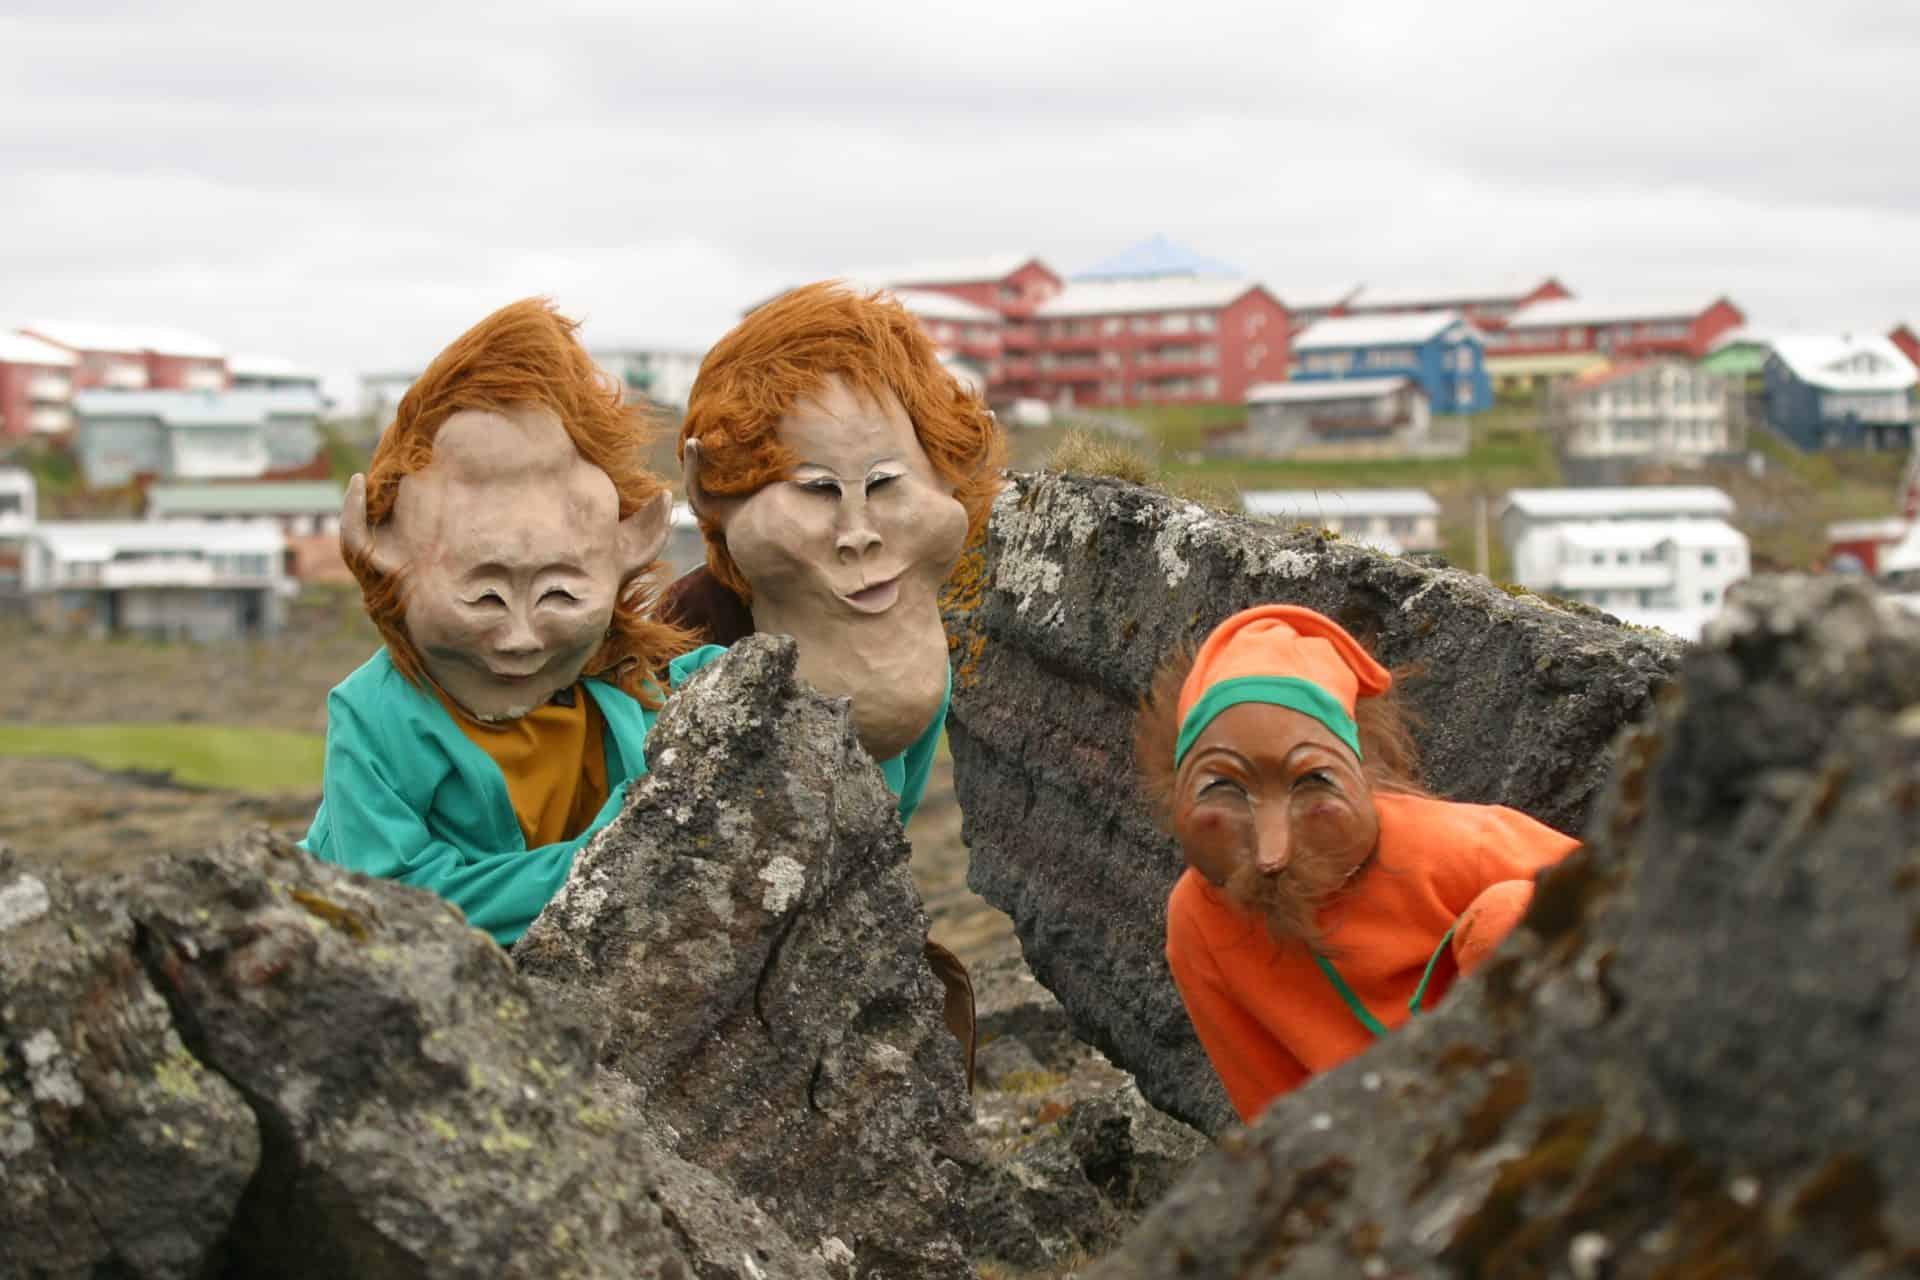 Moradores místicos: visite os elfos naIslândia